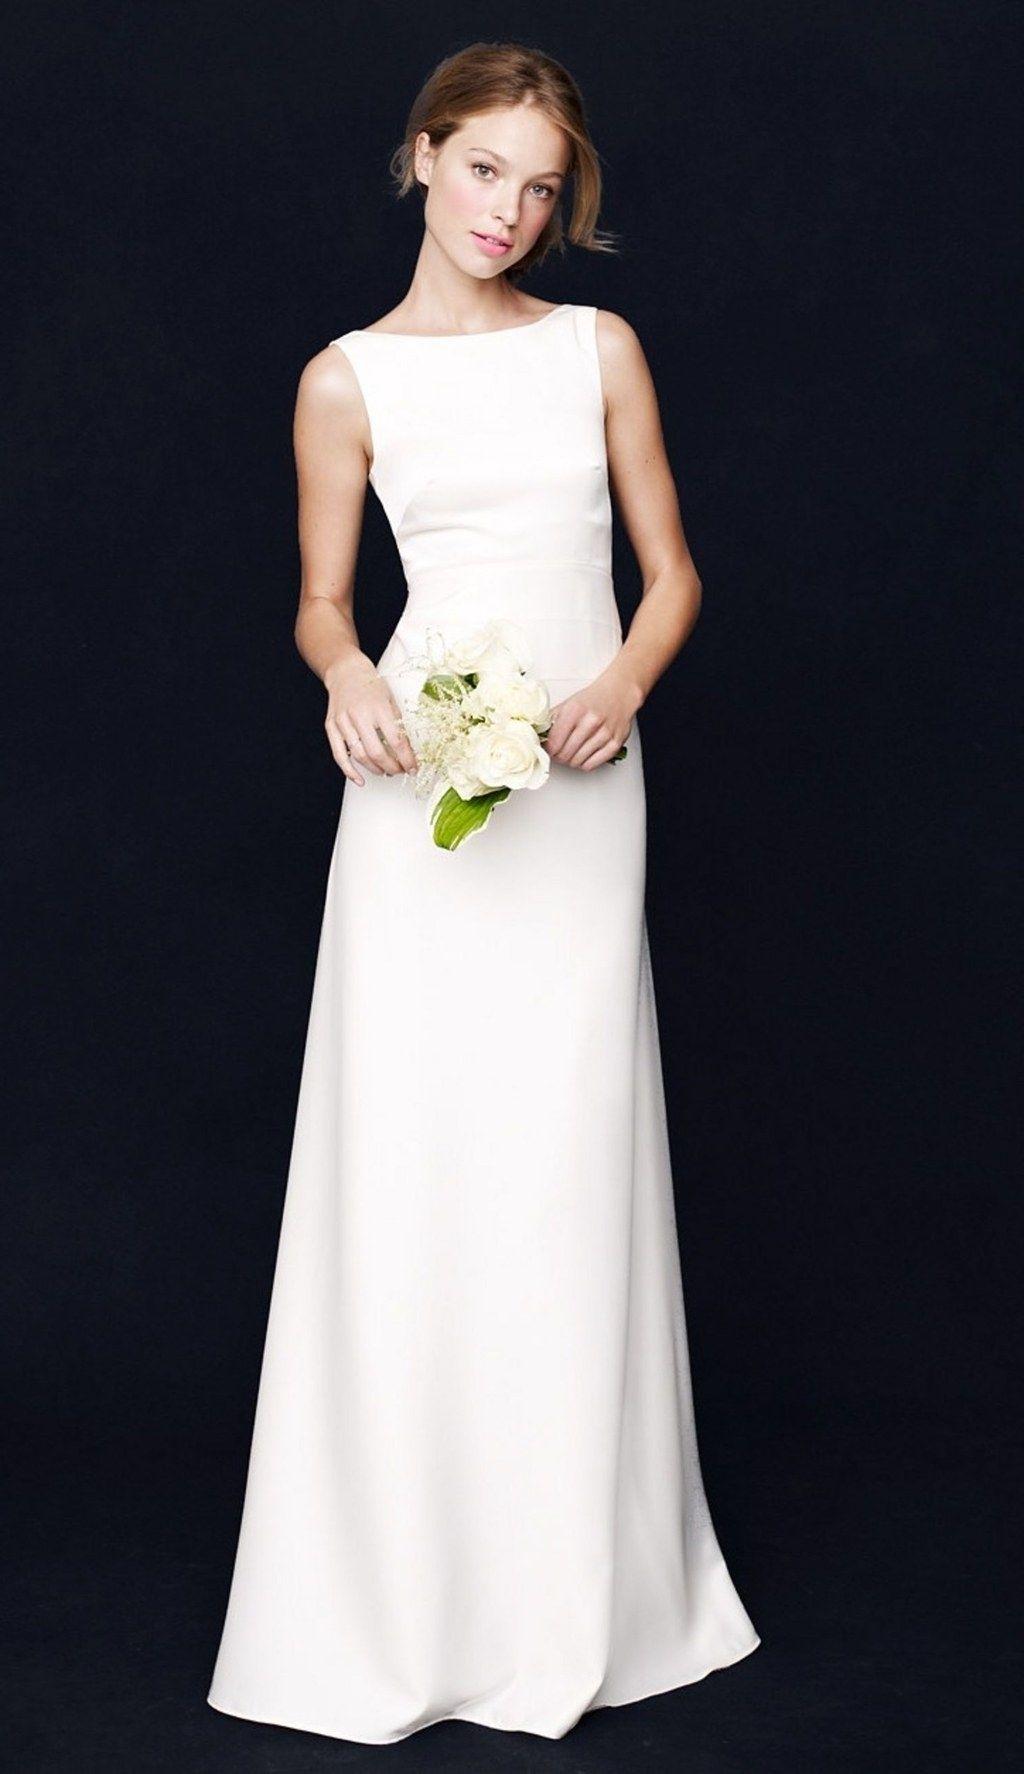 Low Key Wedding Dresses | Wedding Dress | Pinterest | Low key ...